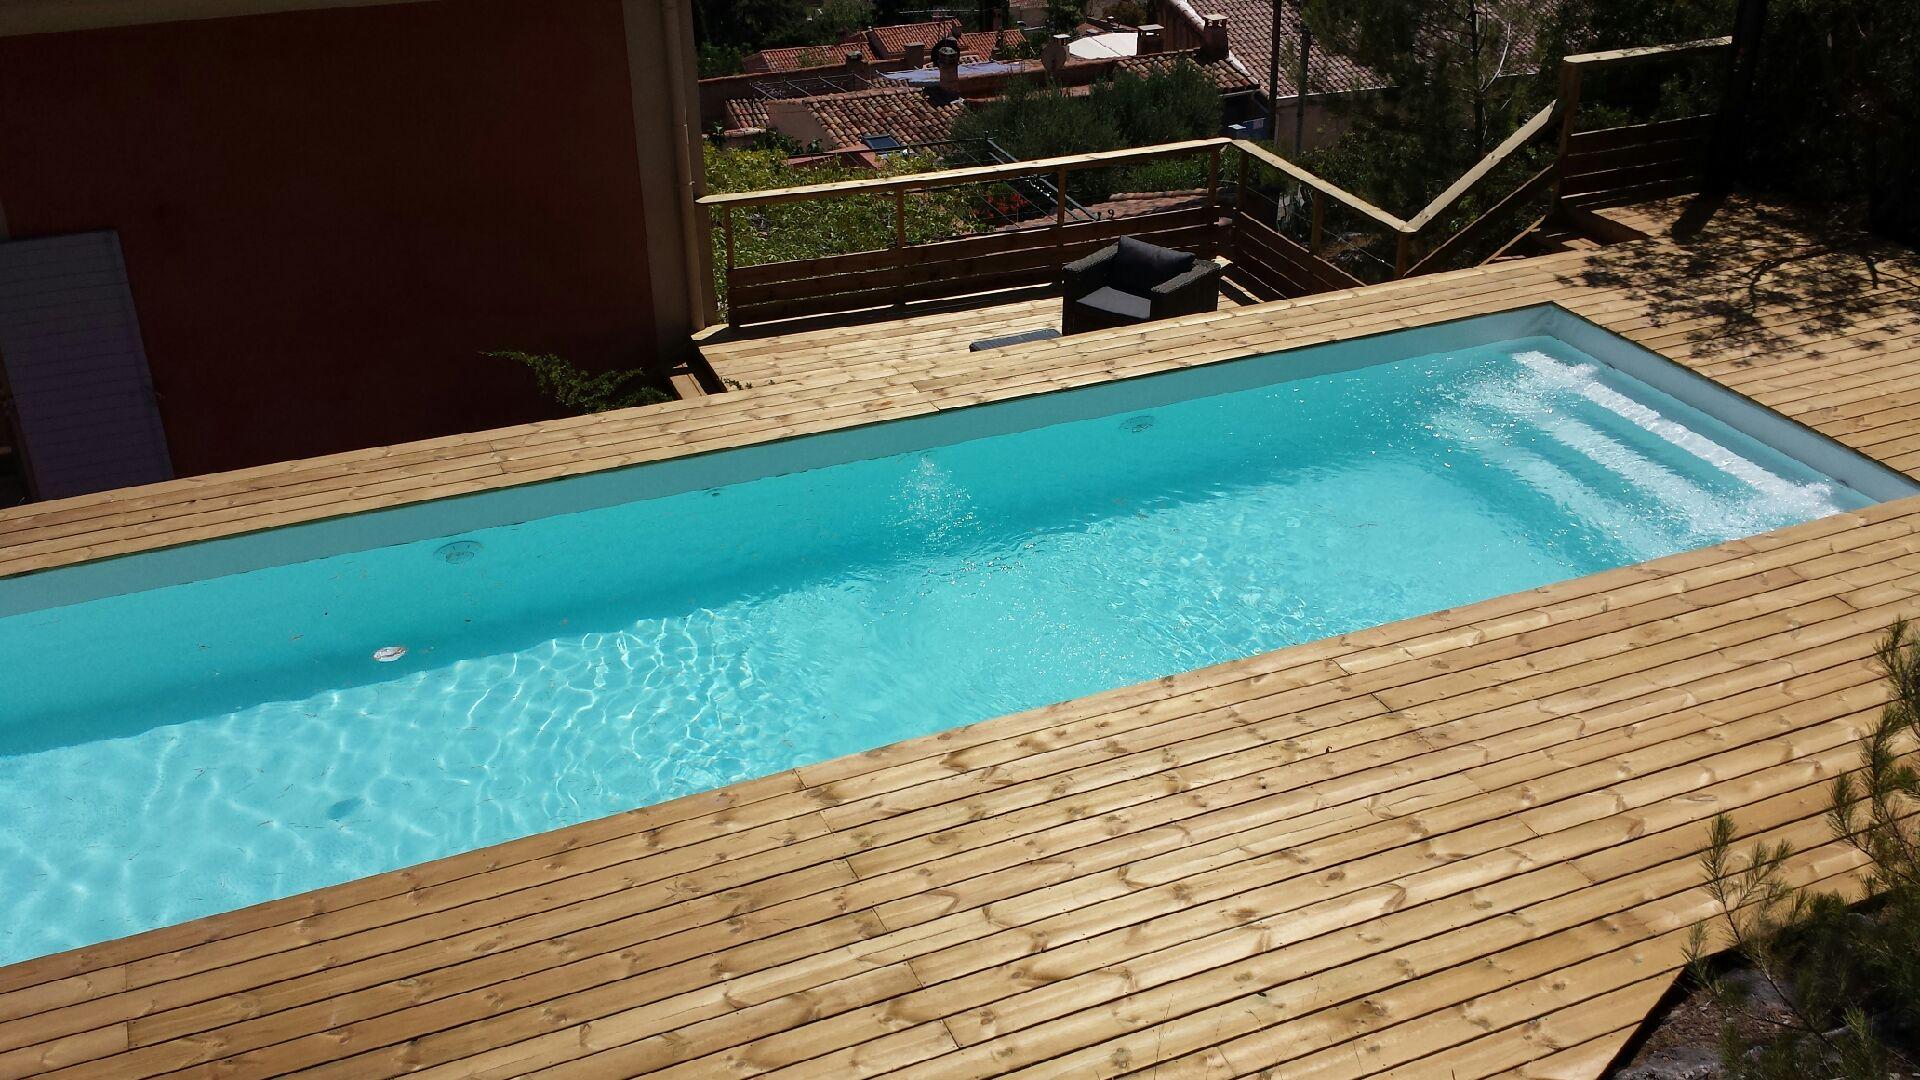 La piscine bois - Piscine bois octogonale lyon ...